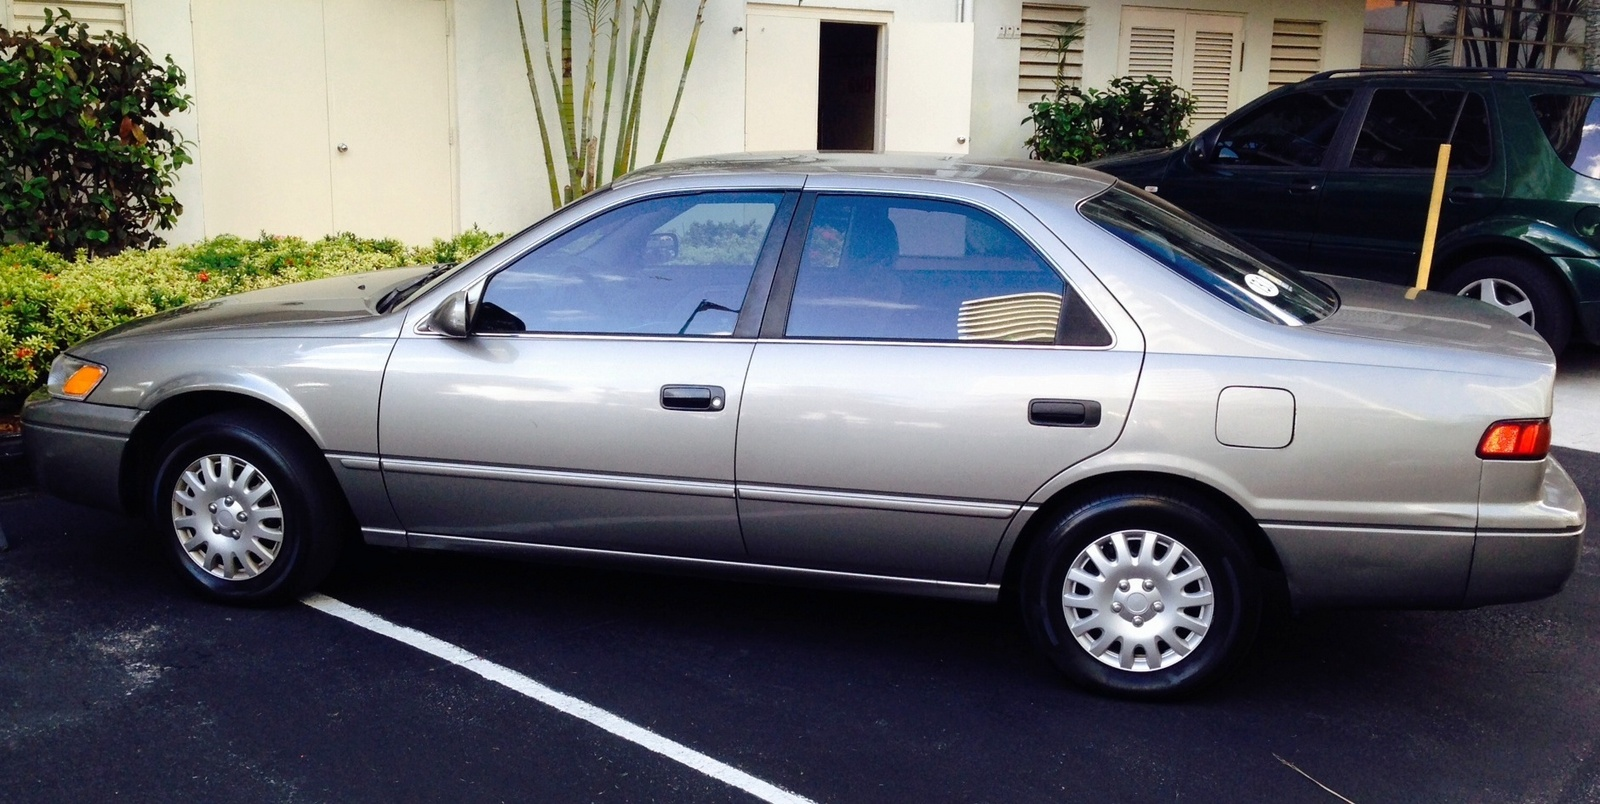 1999 Toyota Camry Pictures Cargurus